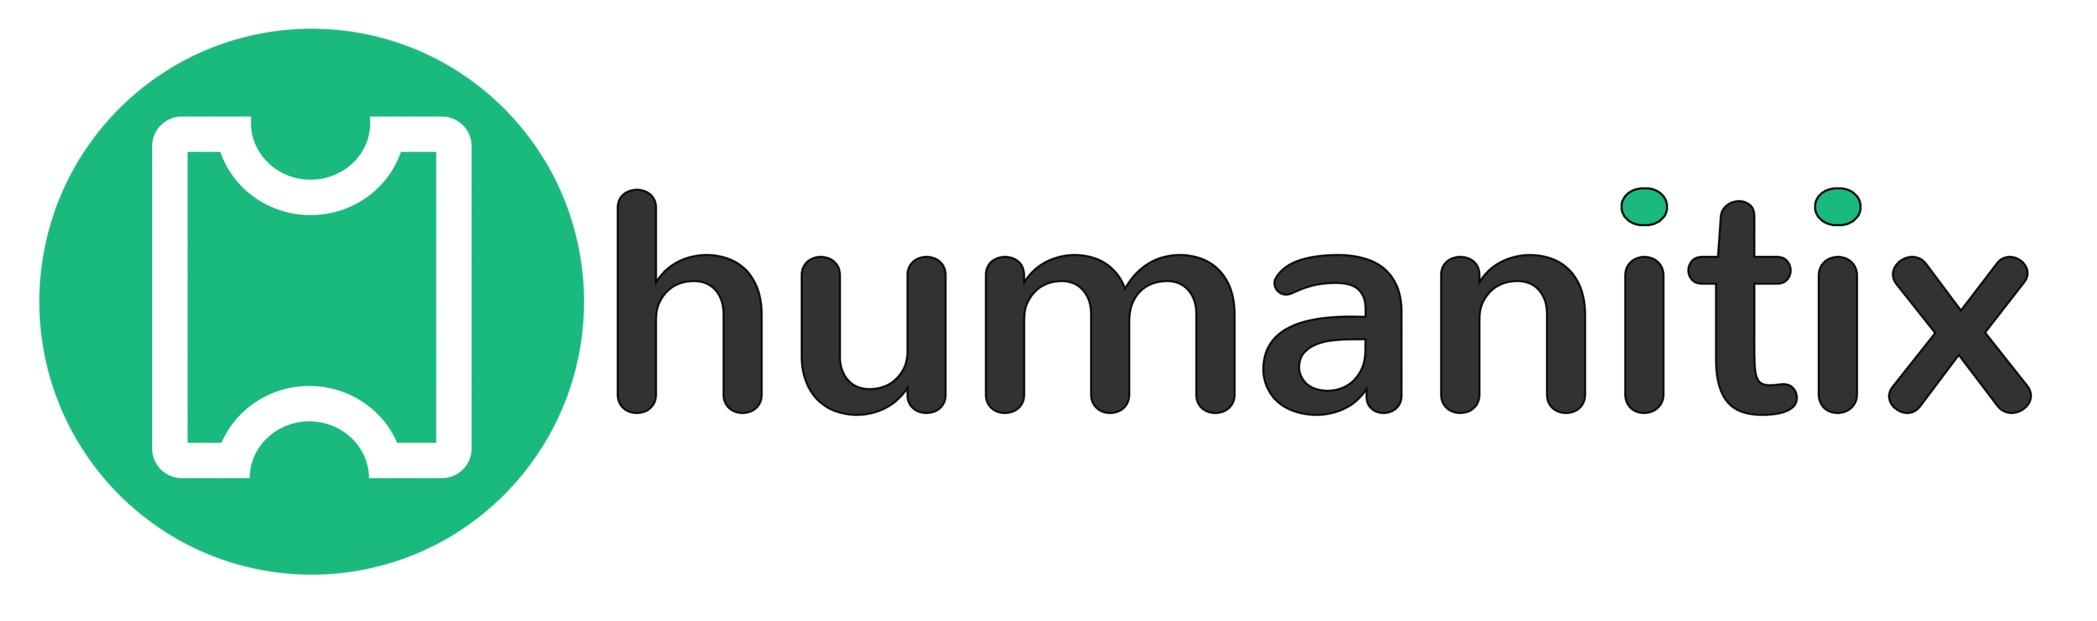 humanitix.jpg